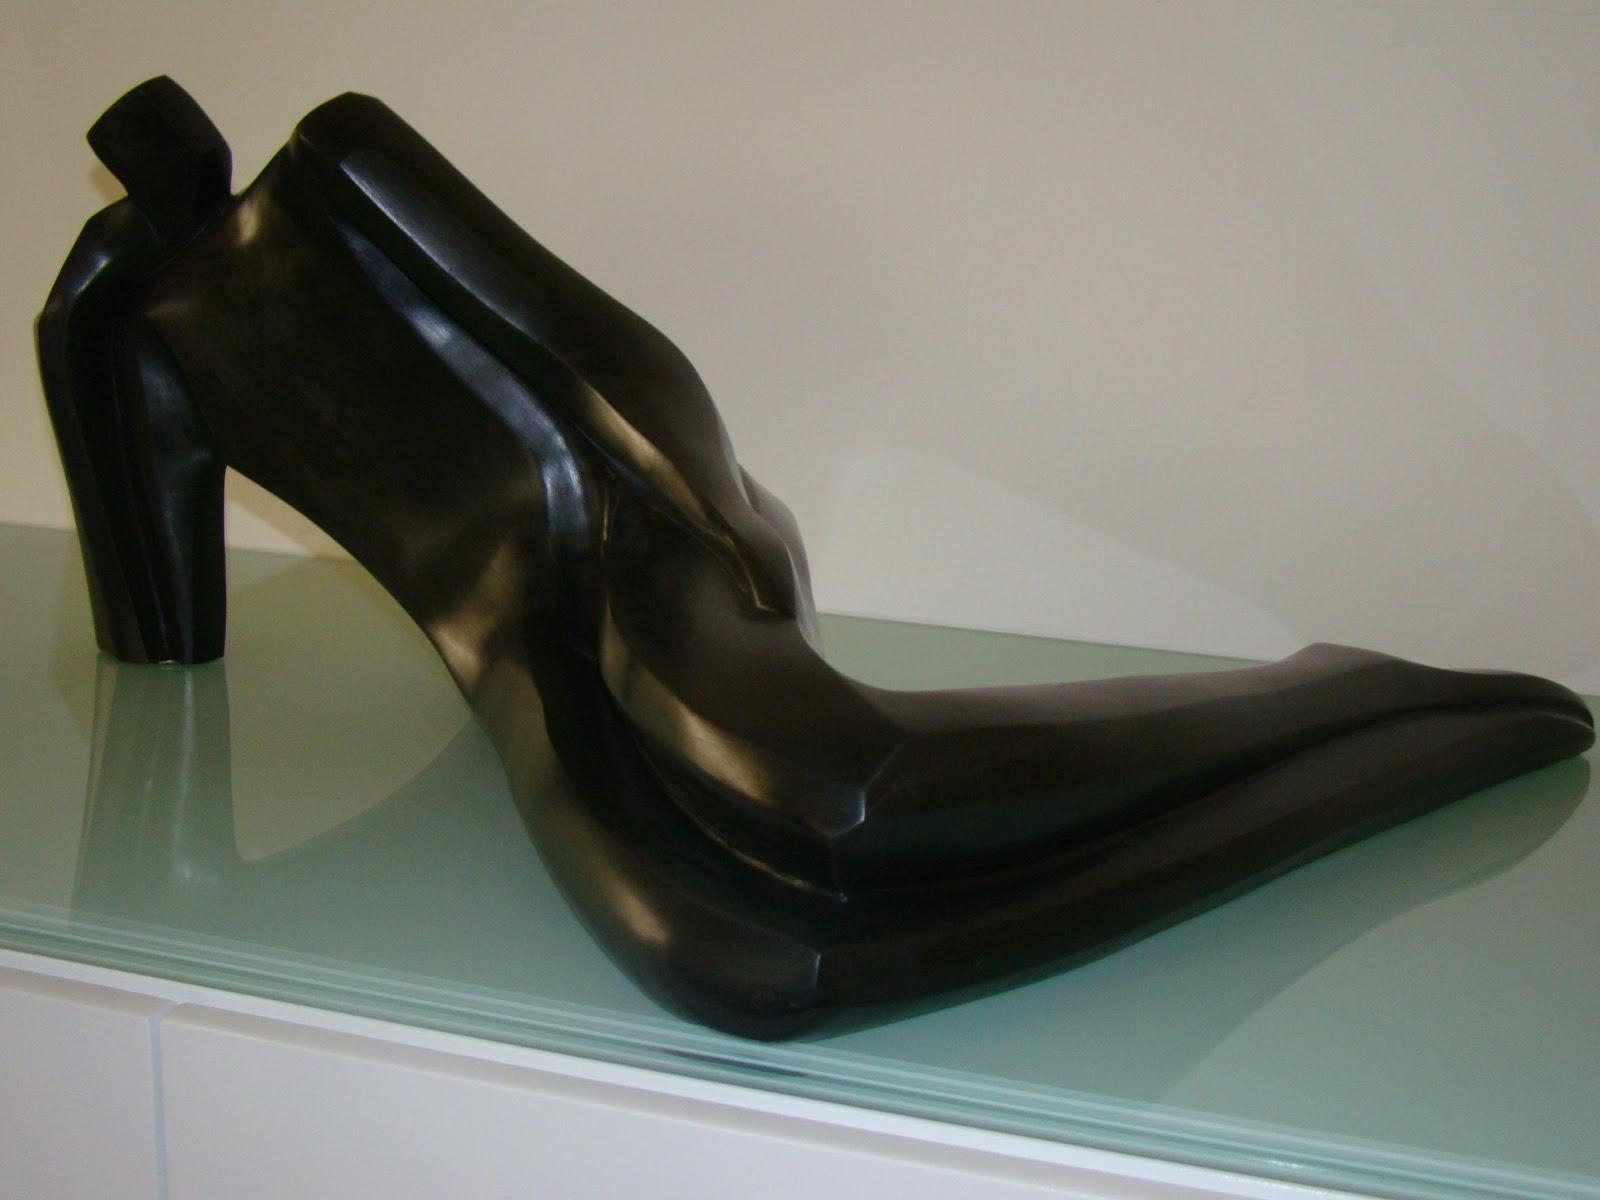 Don - Escultura, Nour Kuri